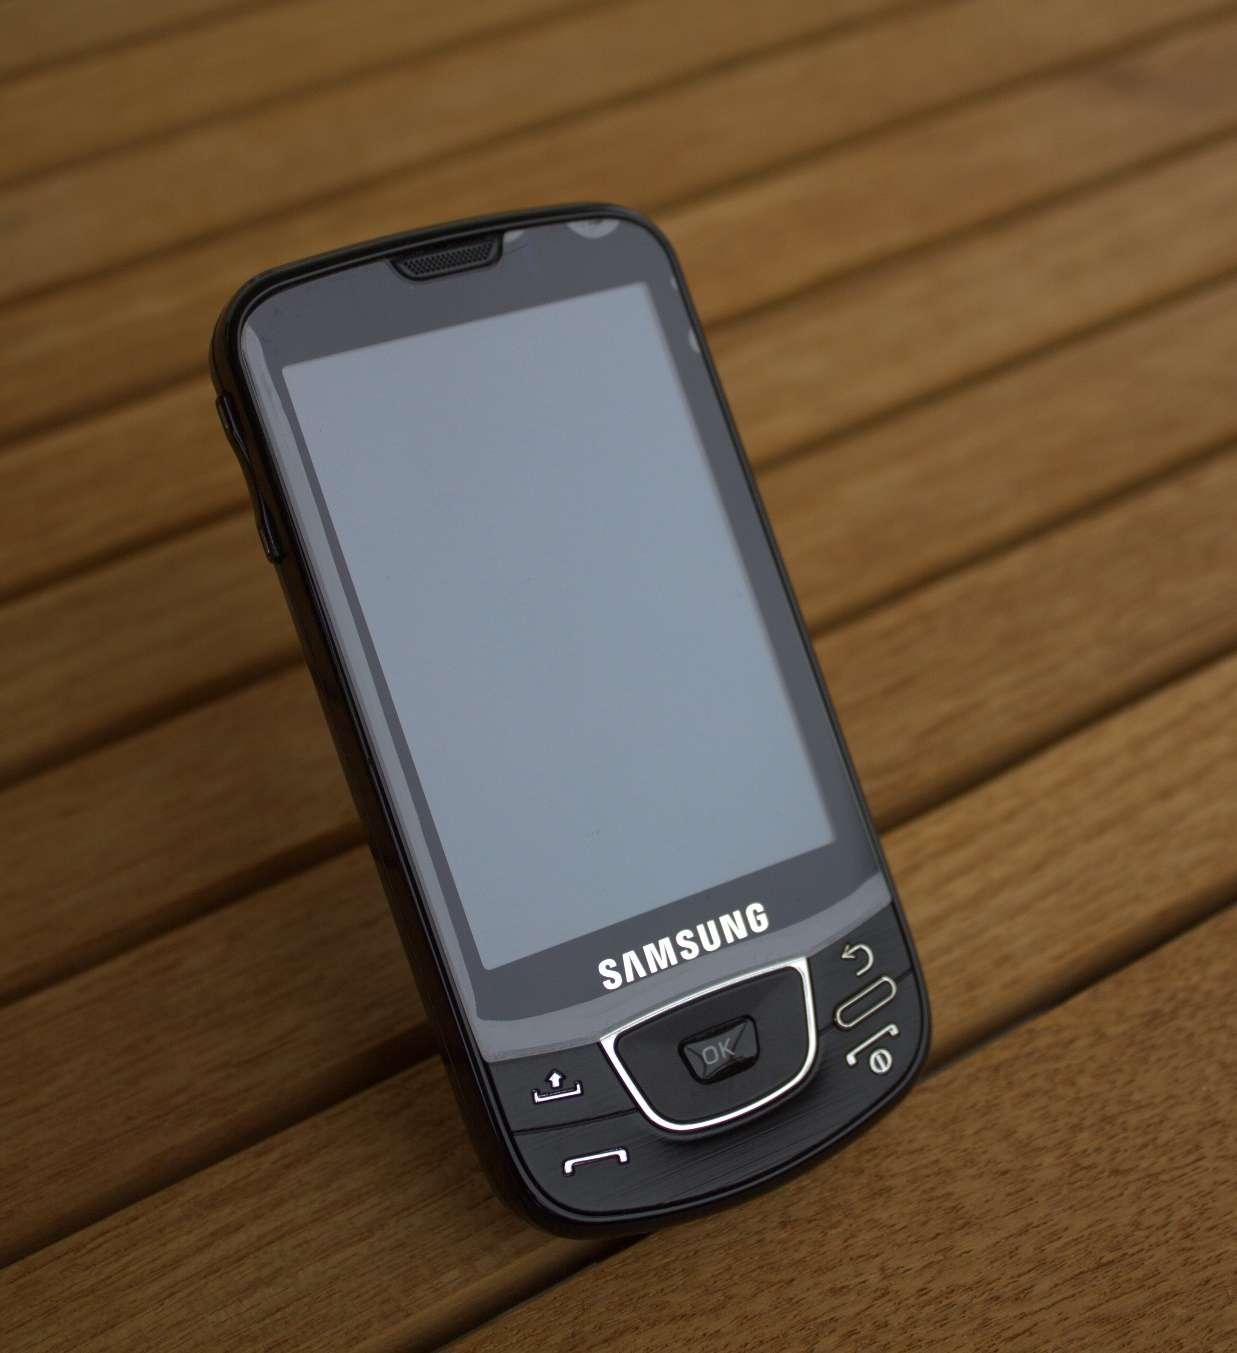 I 7500، اولین گوشی ساخته شده توسط سامسونگ